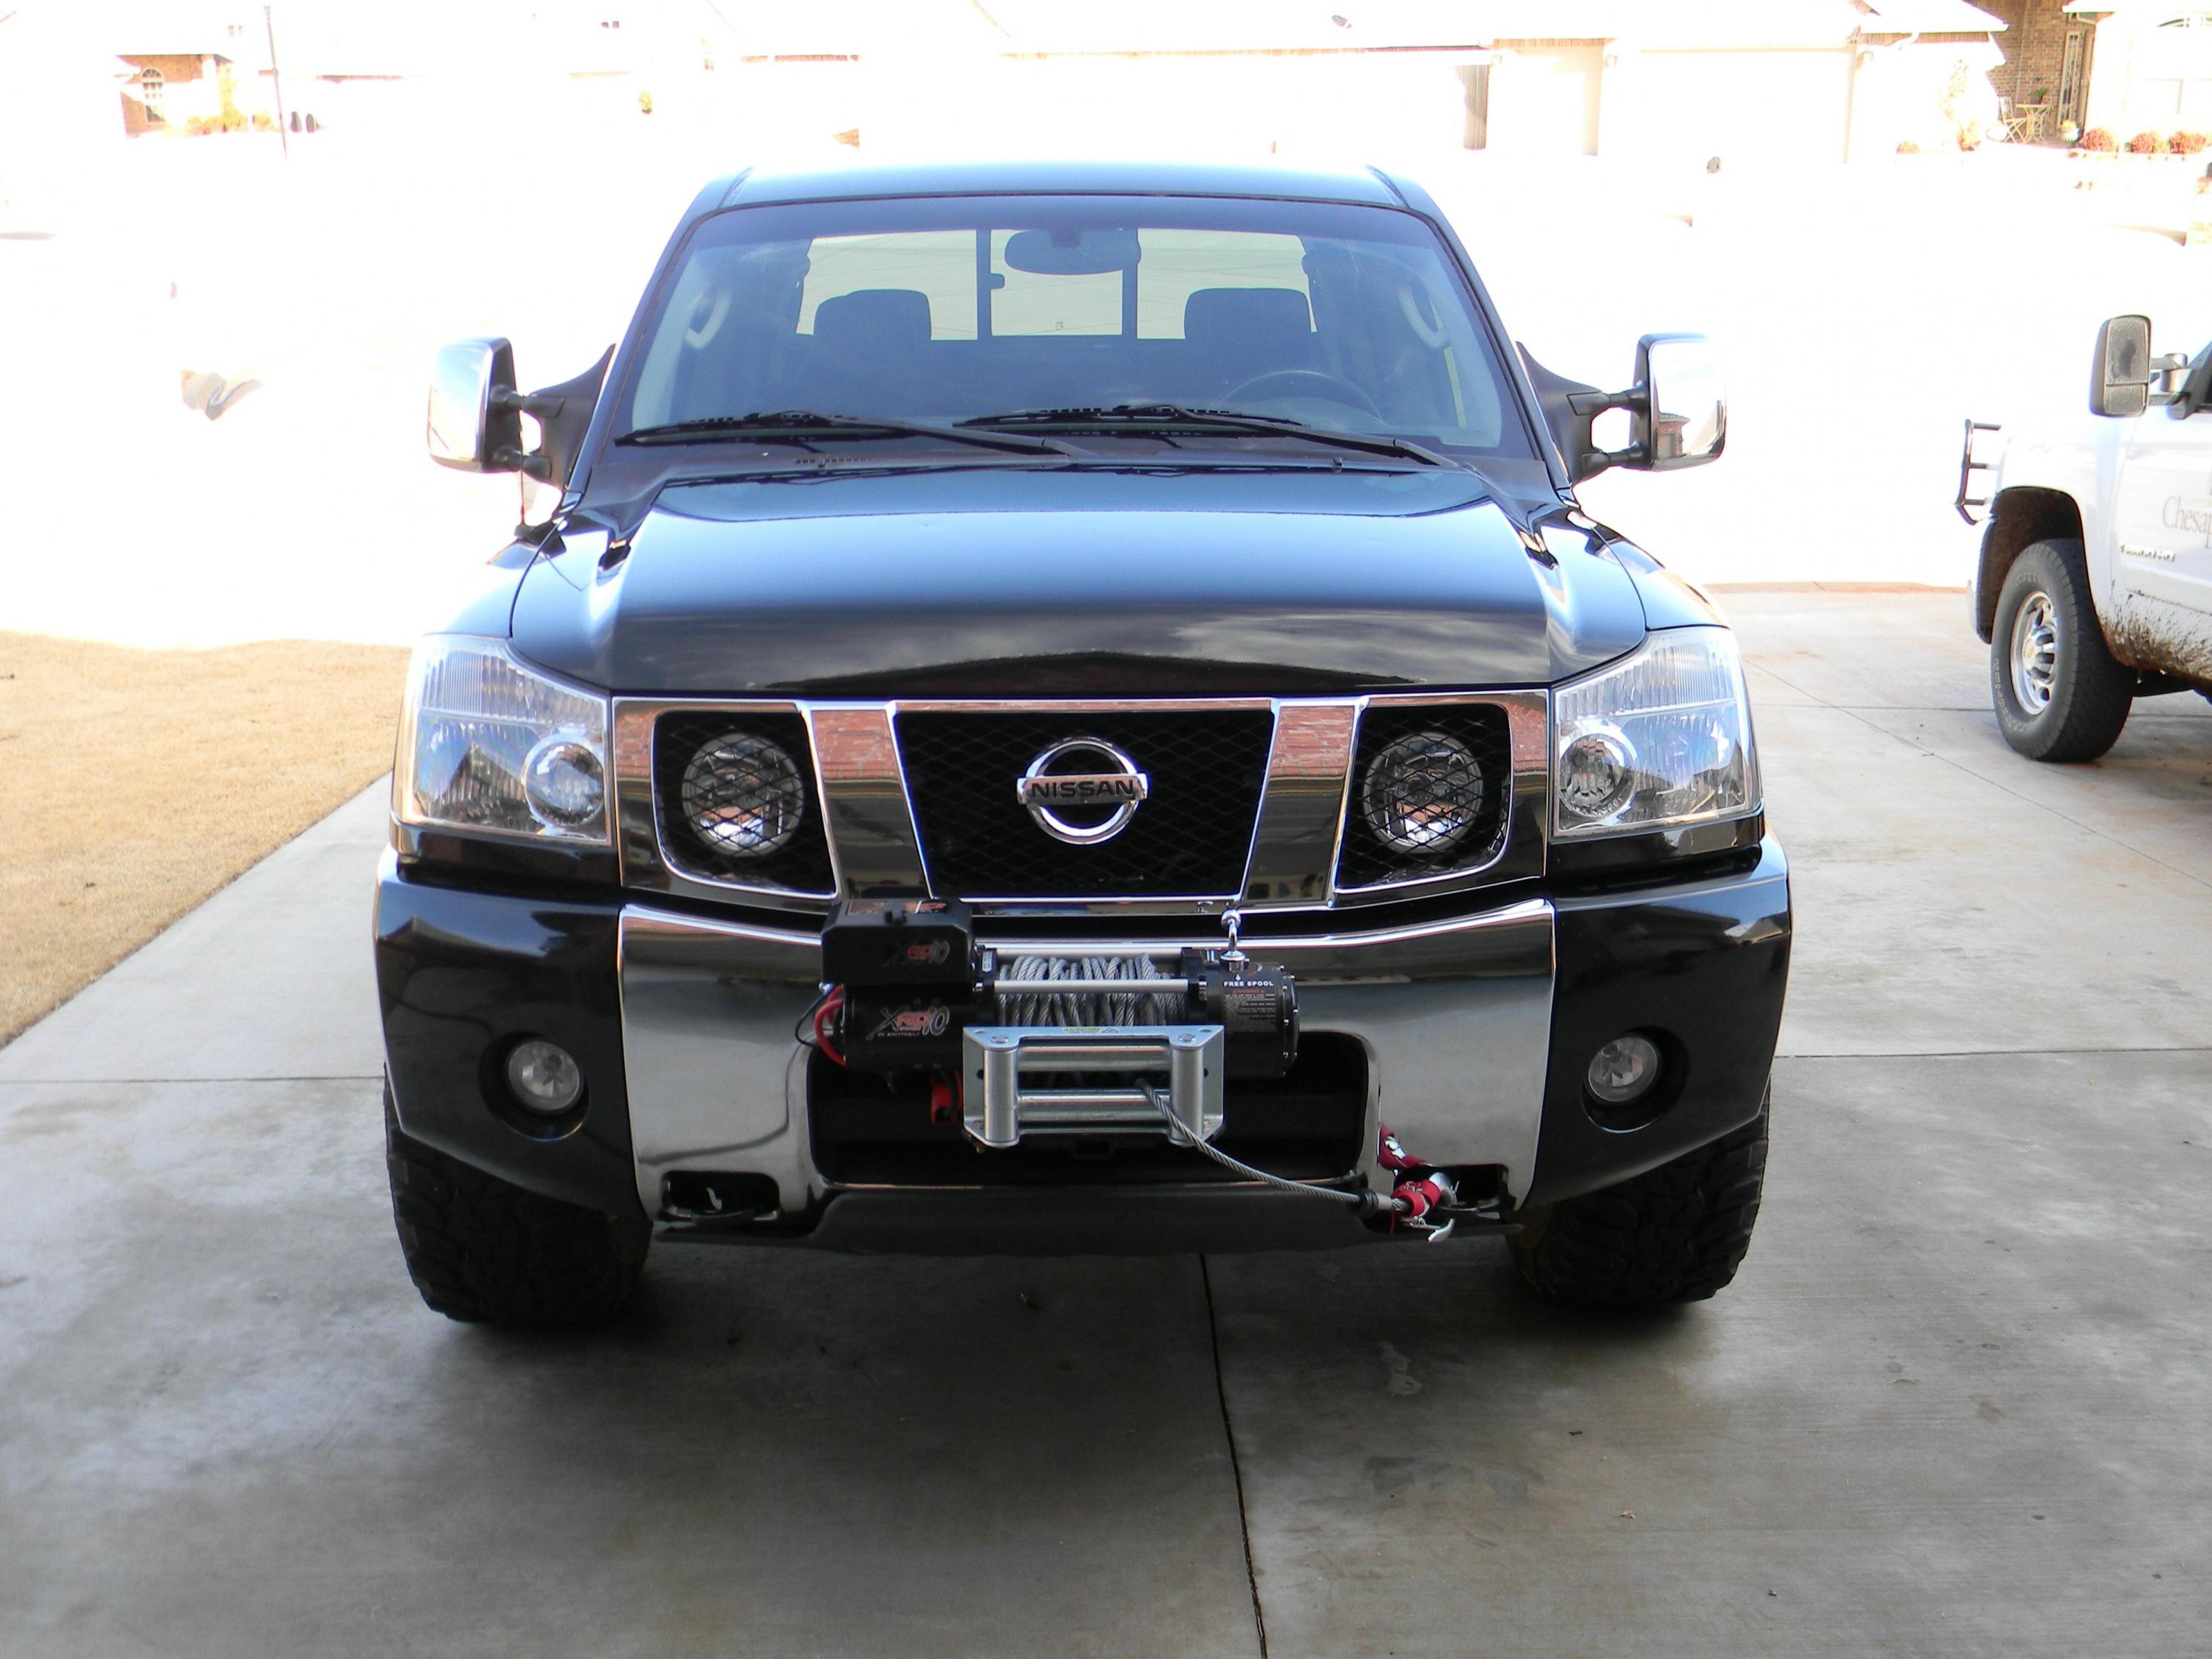 Central Valley Nissan >> PreRunner Bumper with front Hitch Mount - Nissan Titan Forum